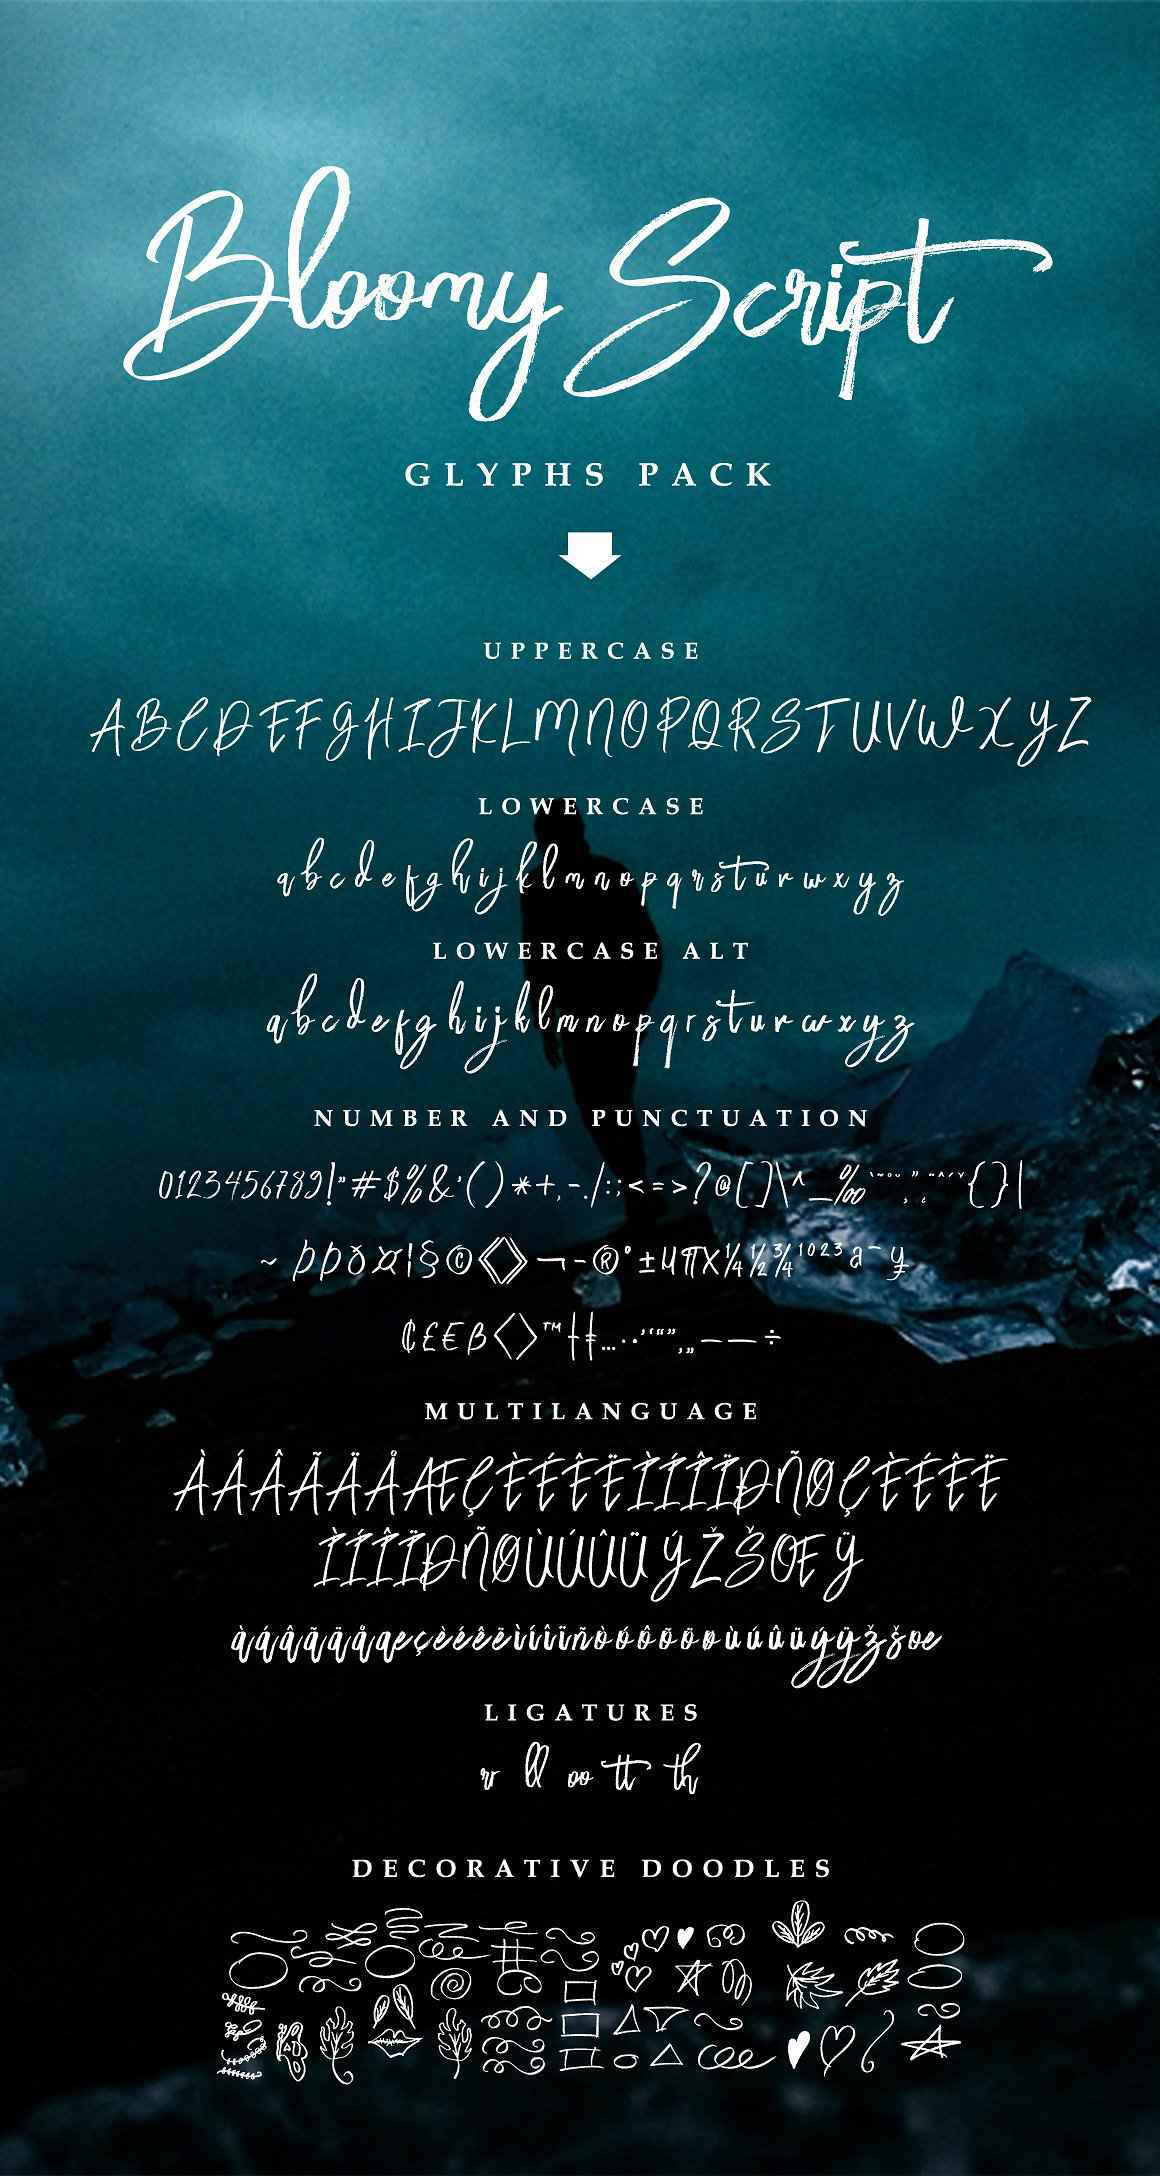 bloomy-script-font-1